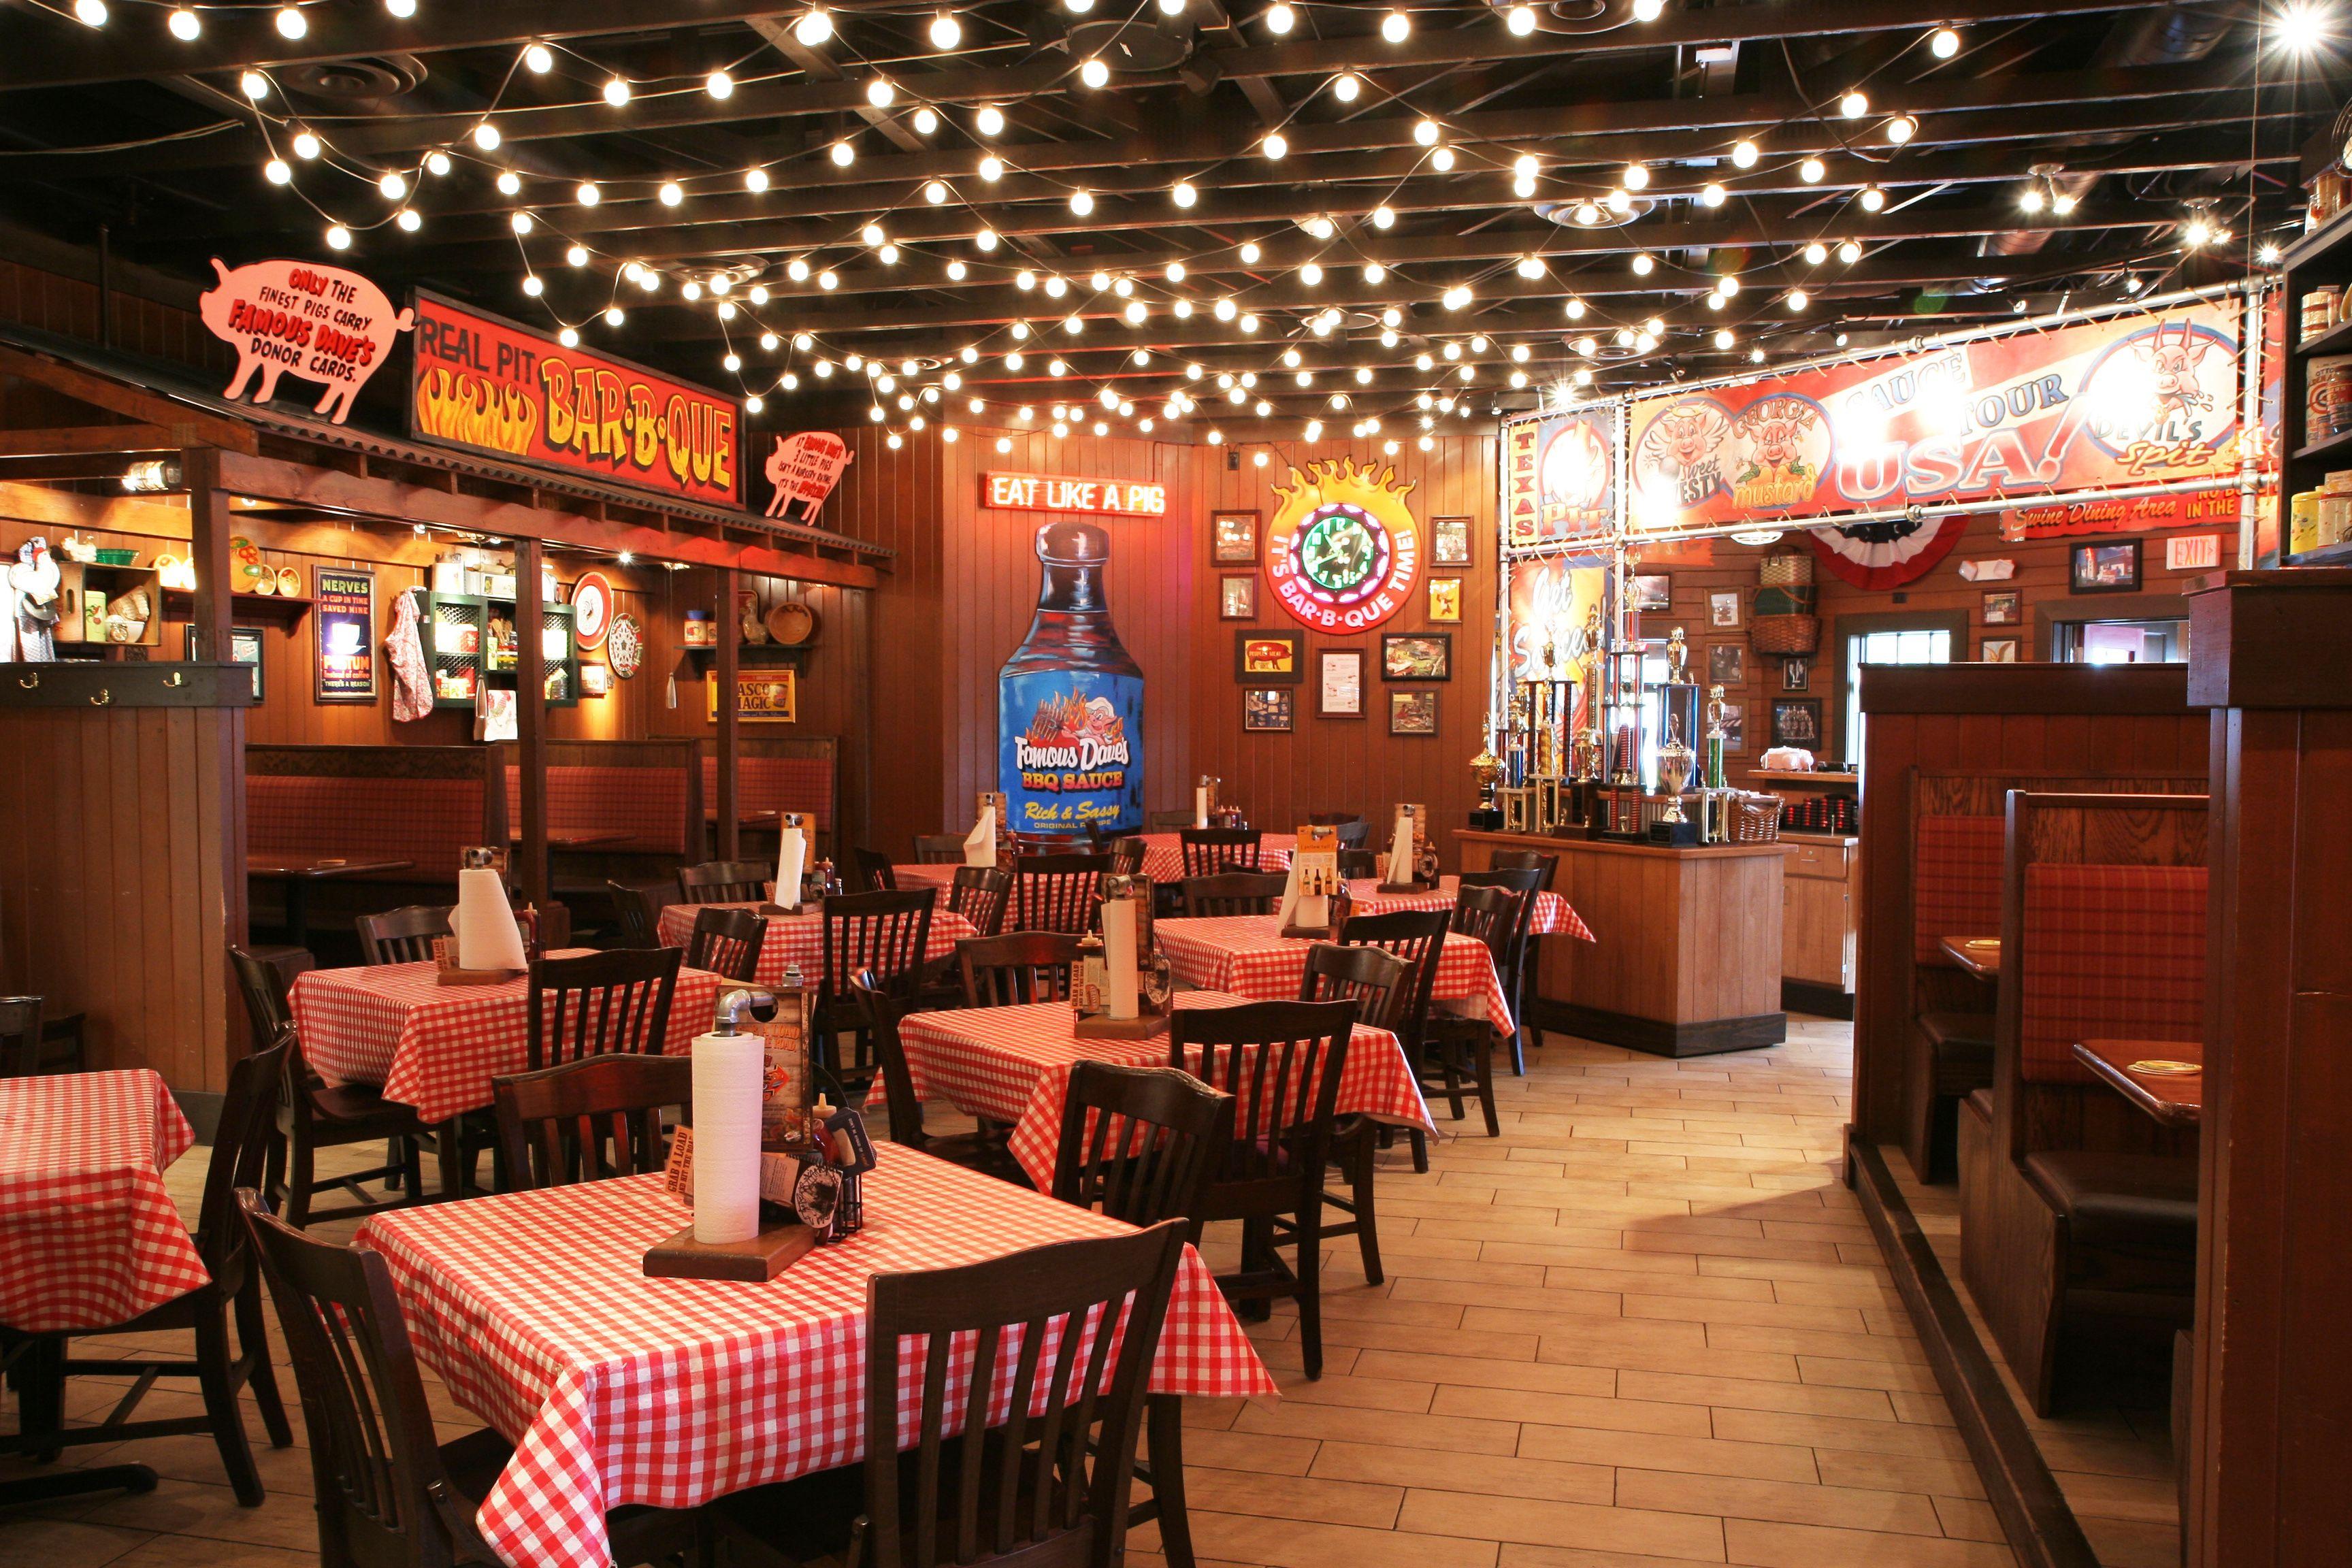 Famous Daves Famous daves, Restaurant recipes, Restaurant